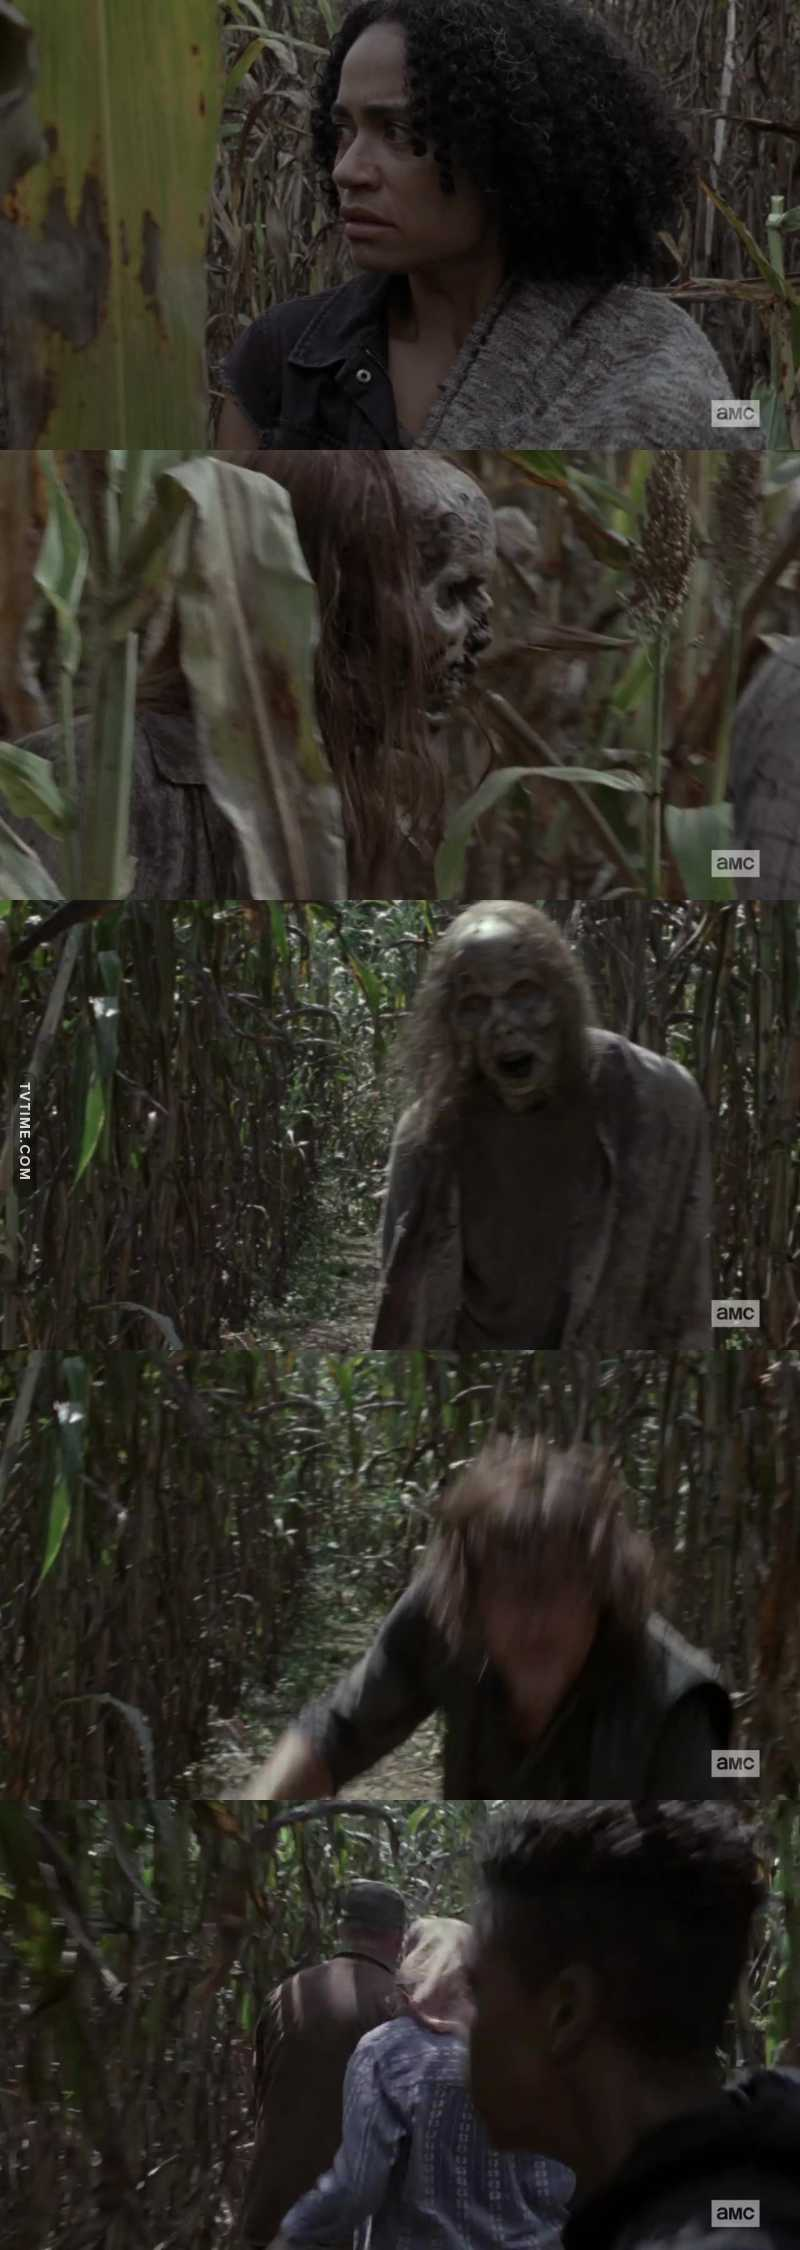 Daryl my man😭😭